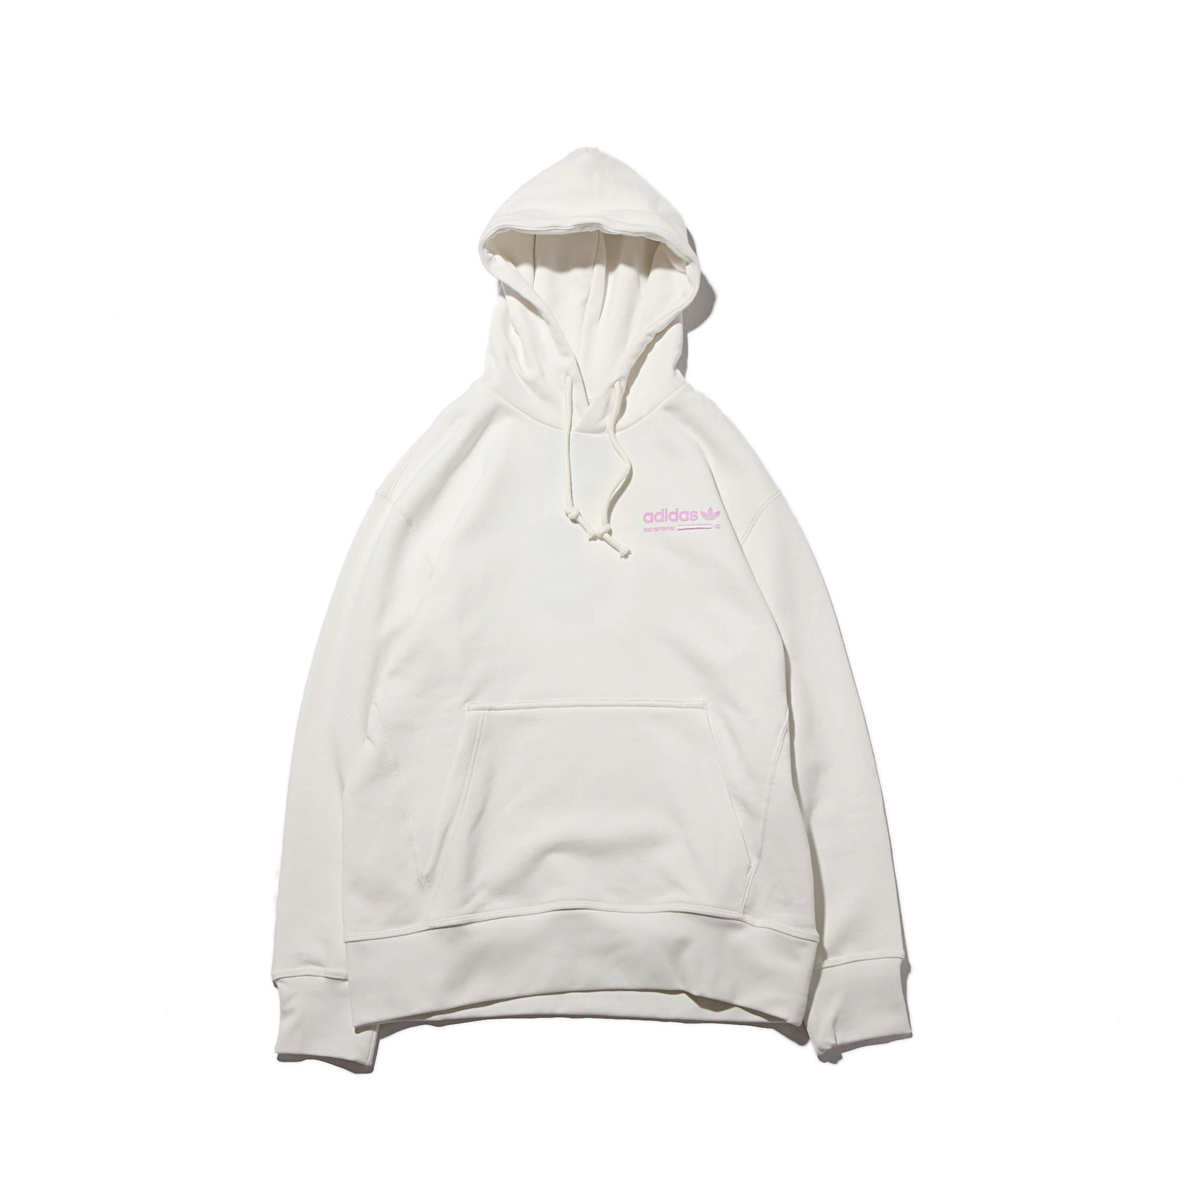 adidas Originals KAVAL OTH HOODIE(アディダス オリジナルス カバルOTH フーディ)CLOUD WHITE【メンズ パーカー】18FW-I